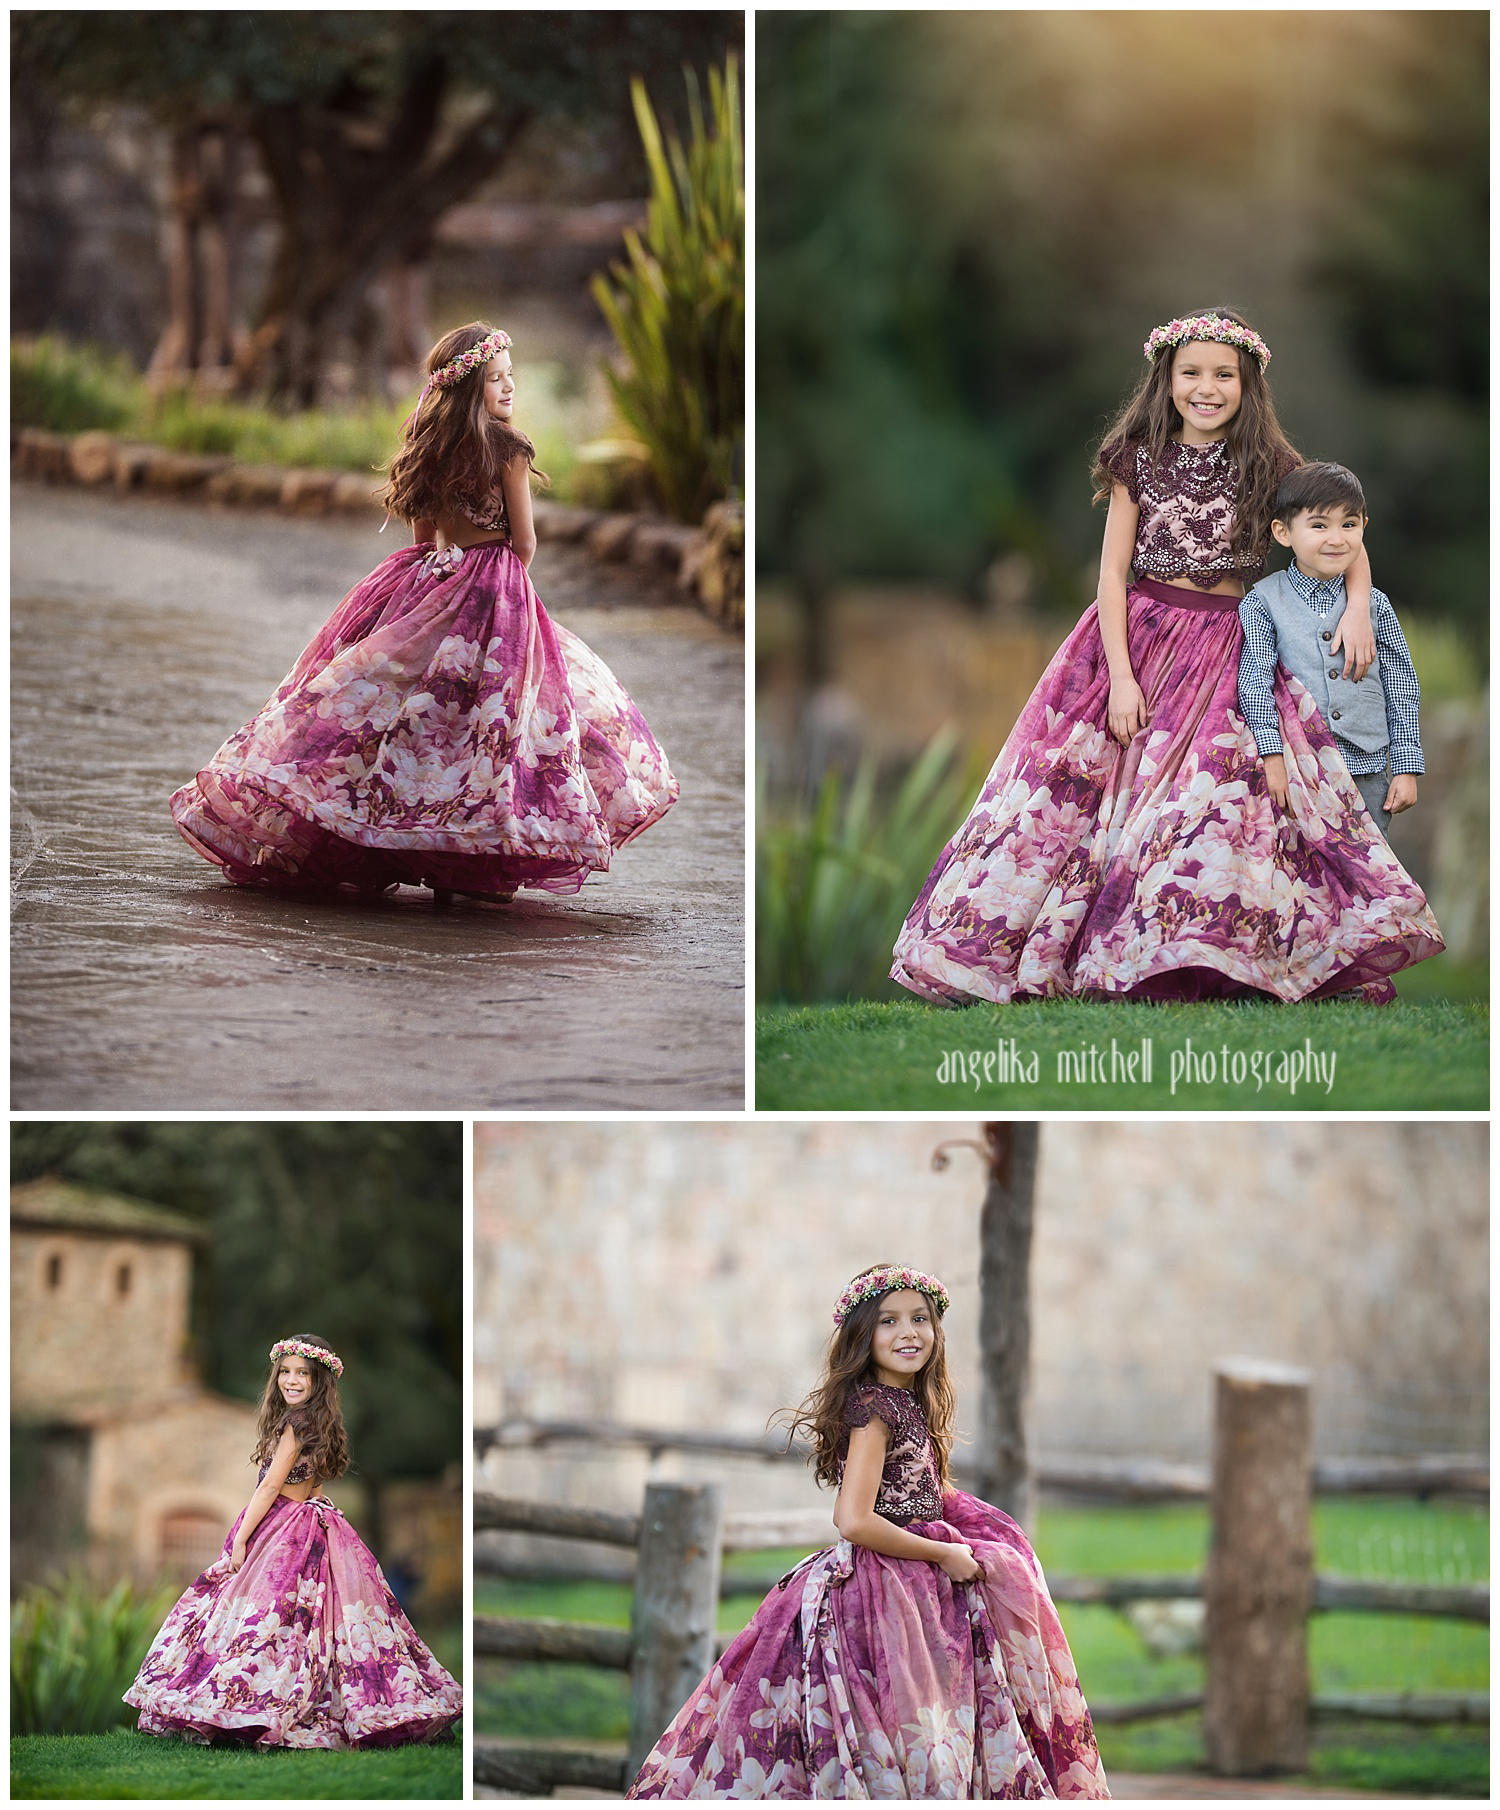 Princess Photo Shoot- Angelika Mitchell Photography- Sonoma County